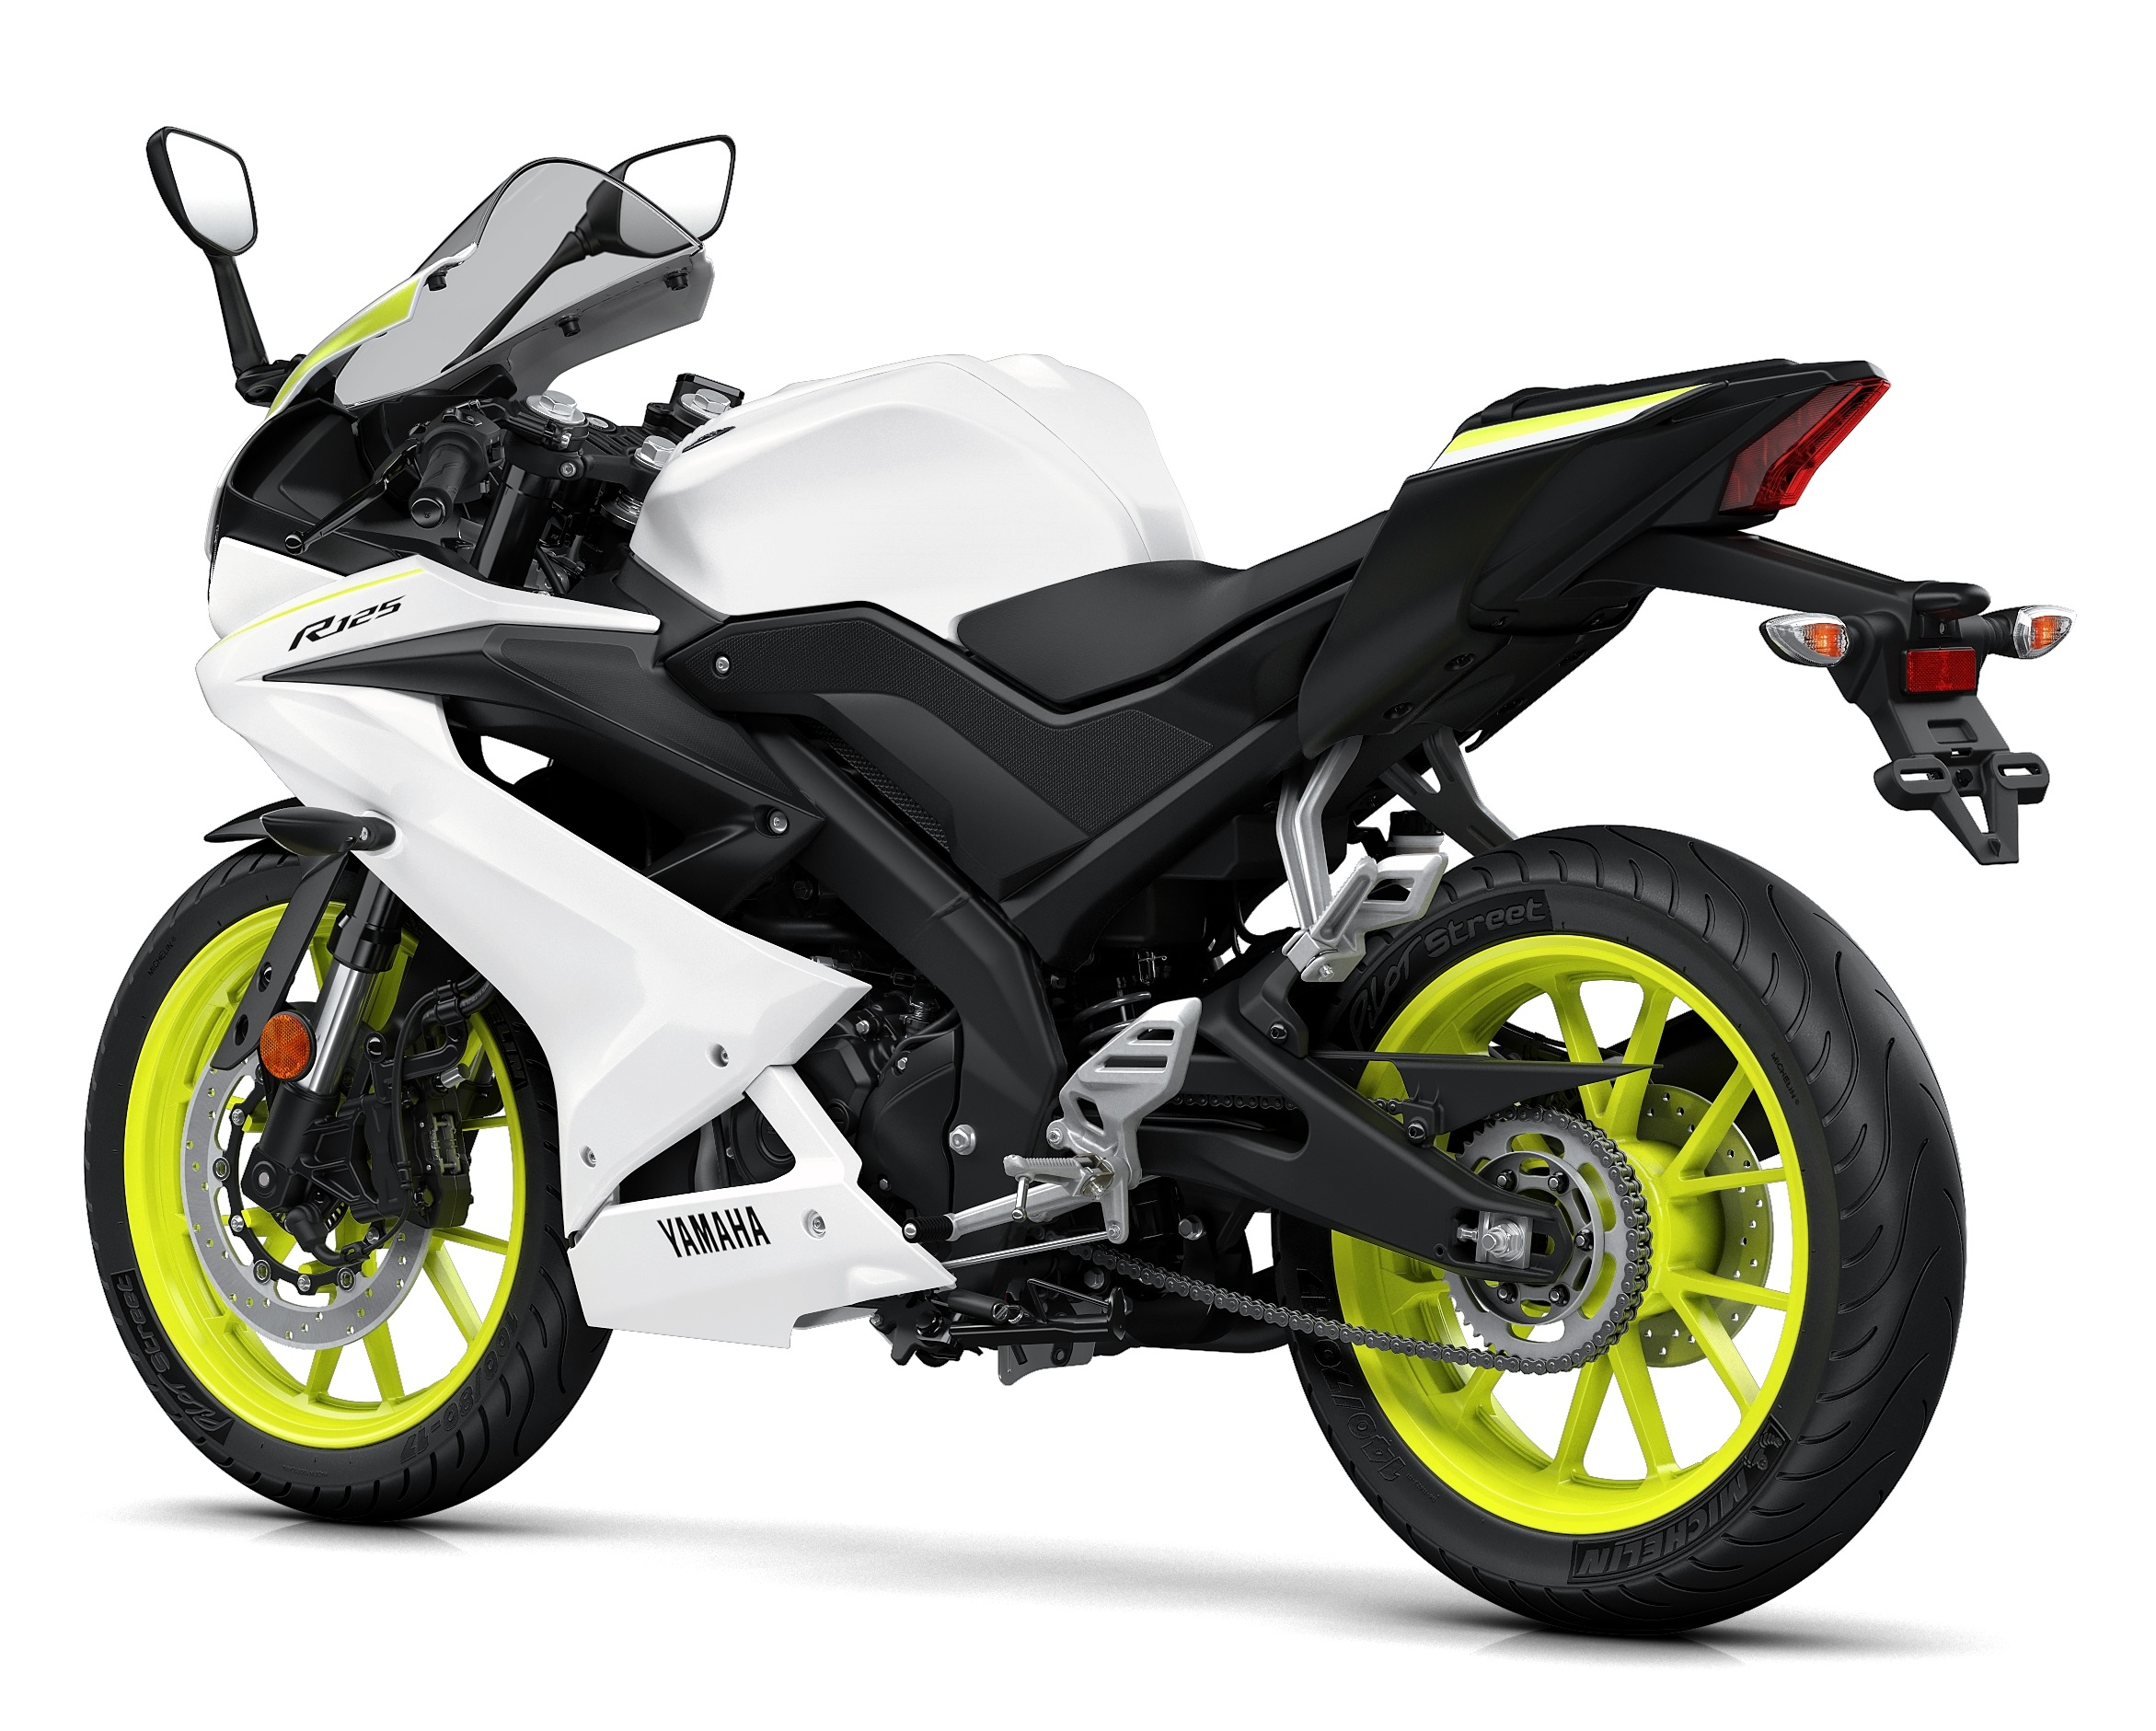 For Sale: Yamaha YZF-R125 • The Bike Market